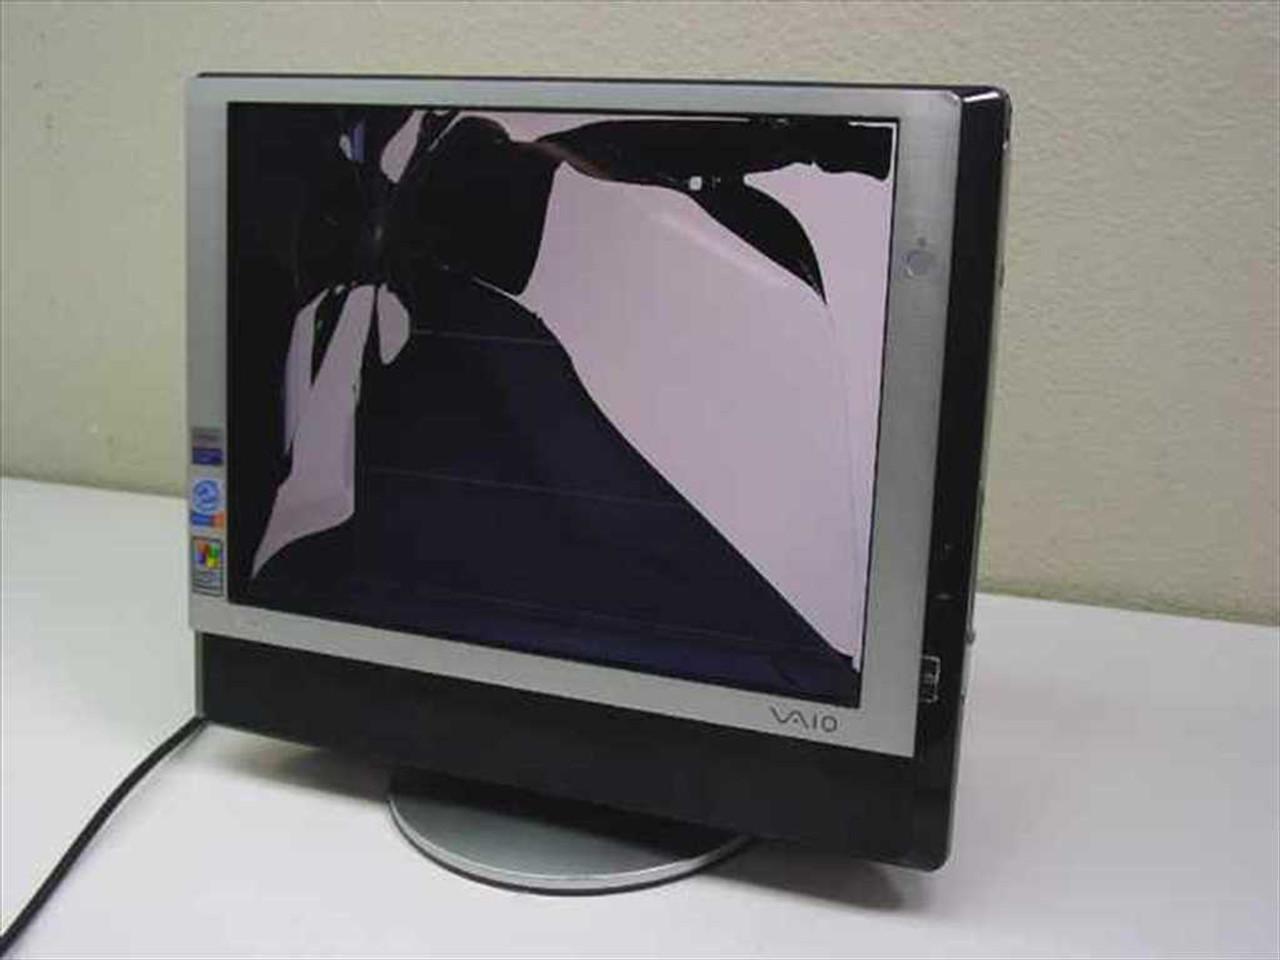 sony vaio pcv v300g drivers for mac download rh humor blog com Sony Vaio Desktop Repair Sony Vaio Desktop Inside